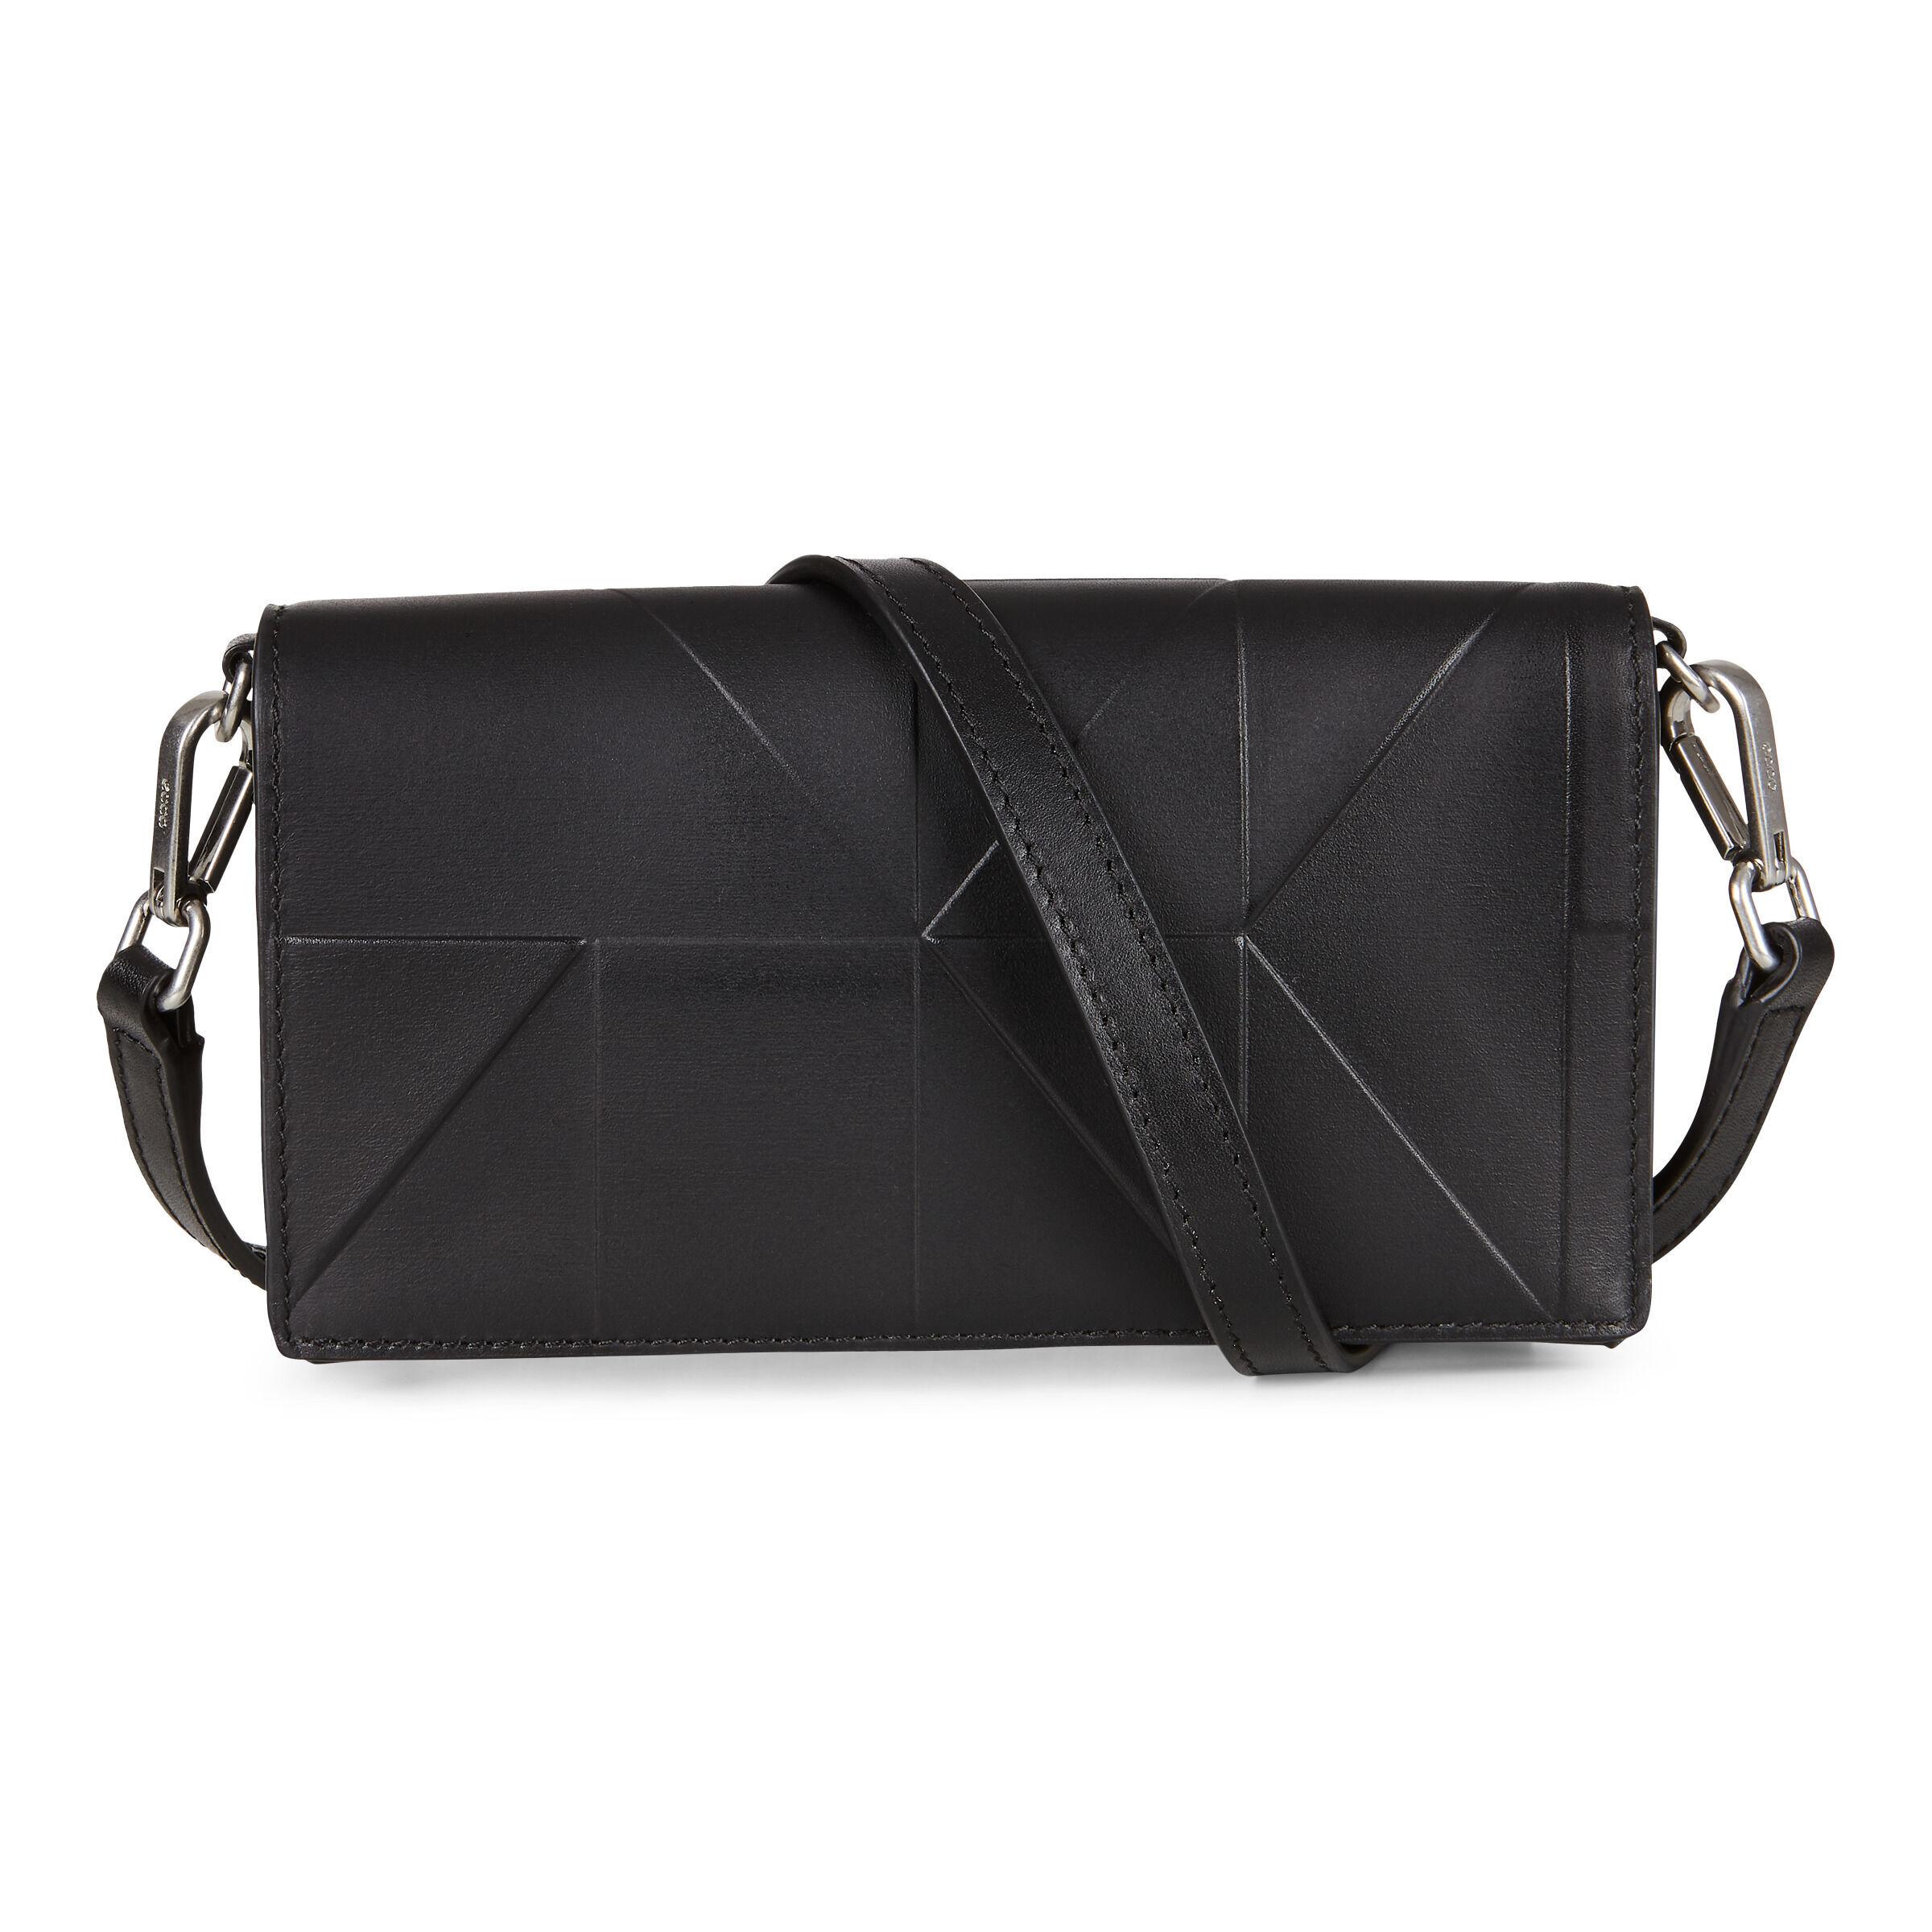 ECCO Geometrik Crossbody Wallet: One Size - Black